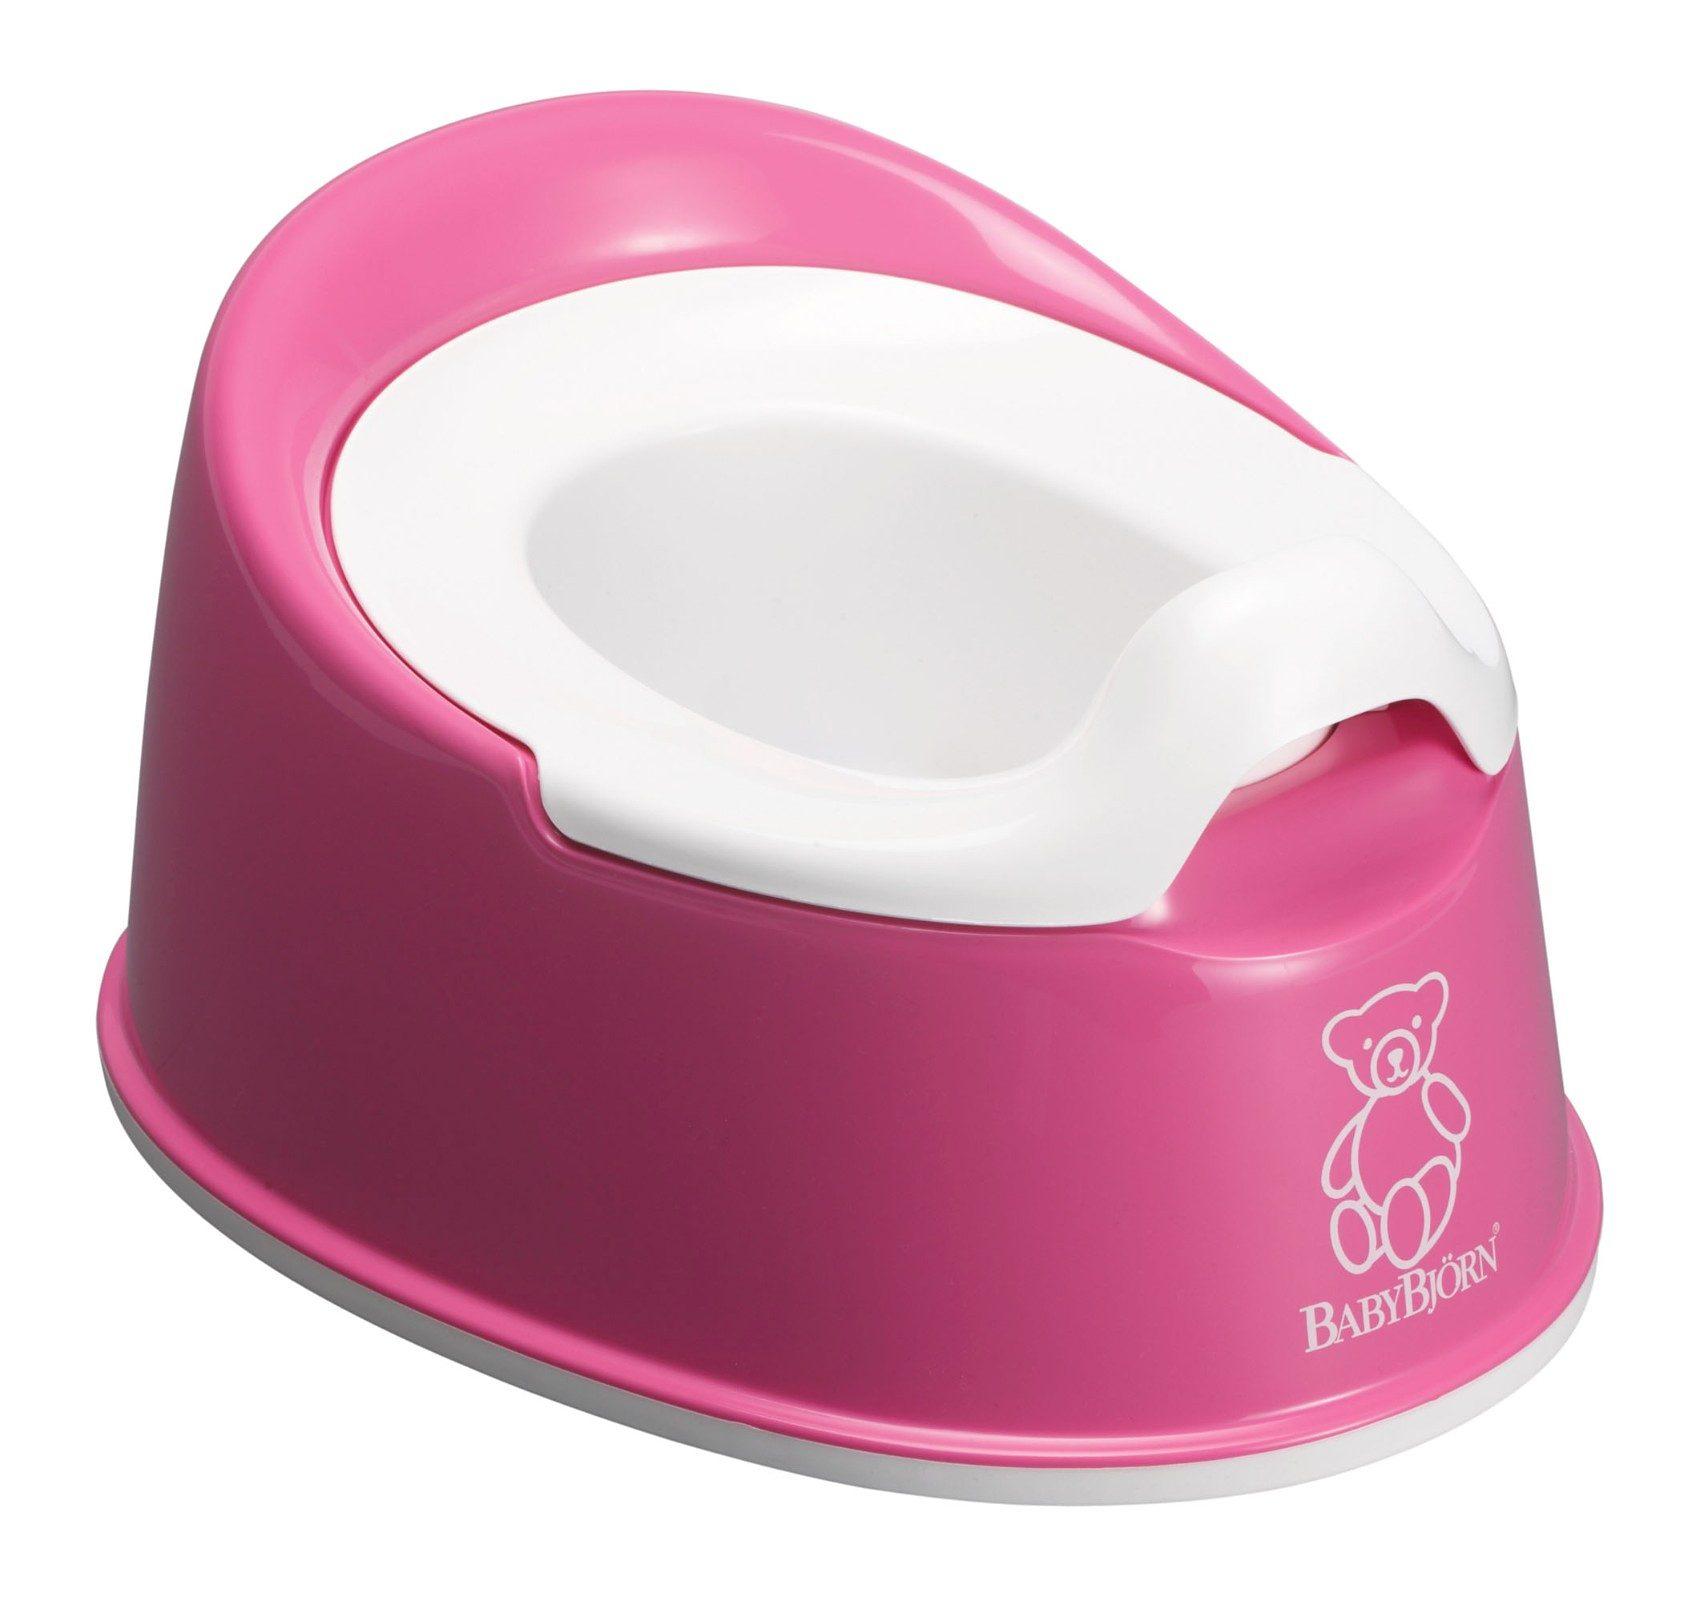 BabyBjörn Cleveres Töpfchen, Pink